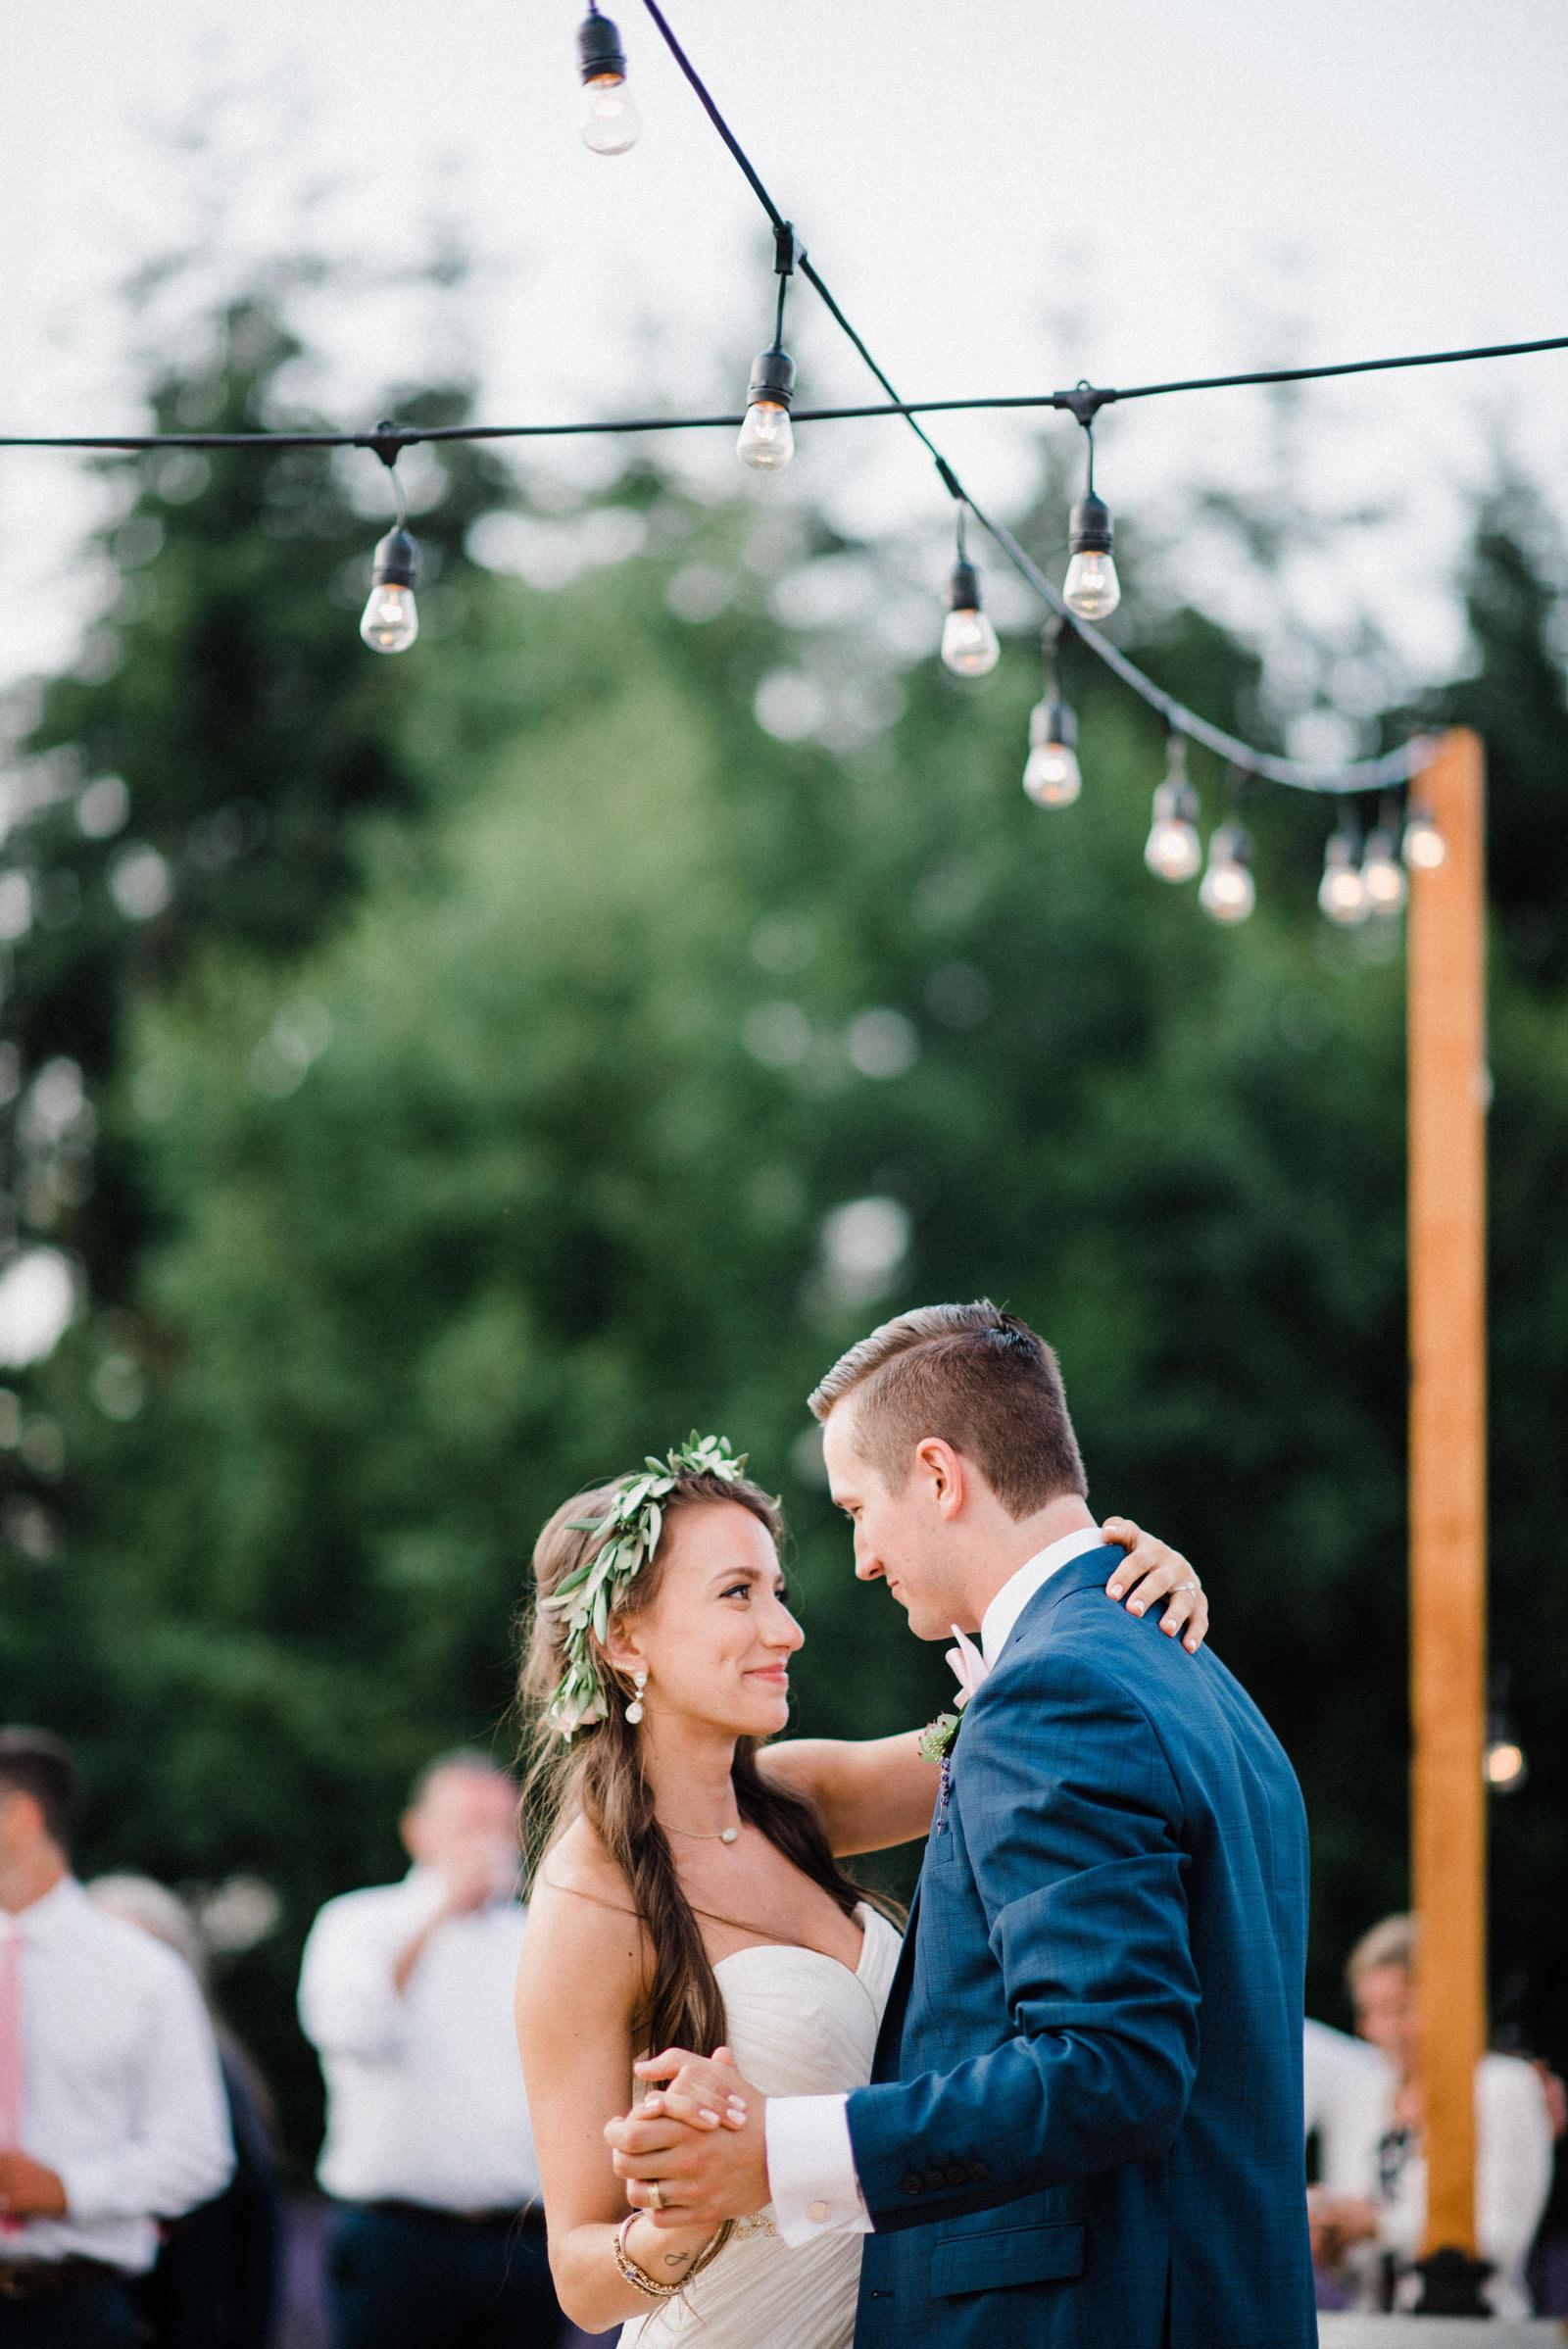 076-woodinville-lavendar-farm-wedding-with-golden-glowy-photos.jpg